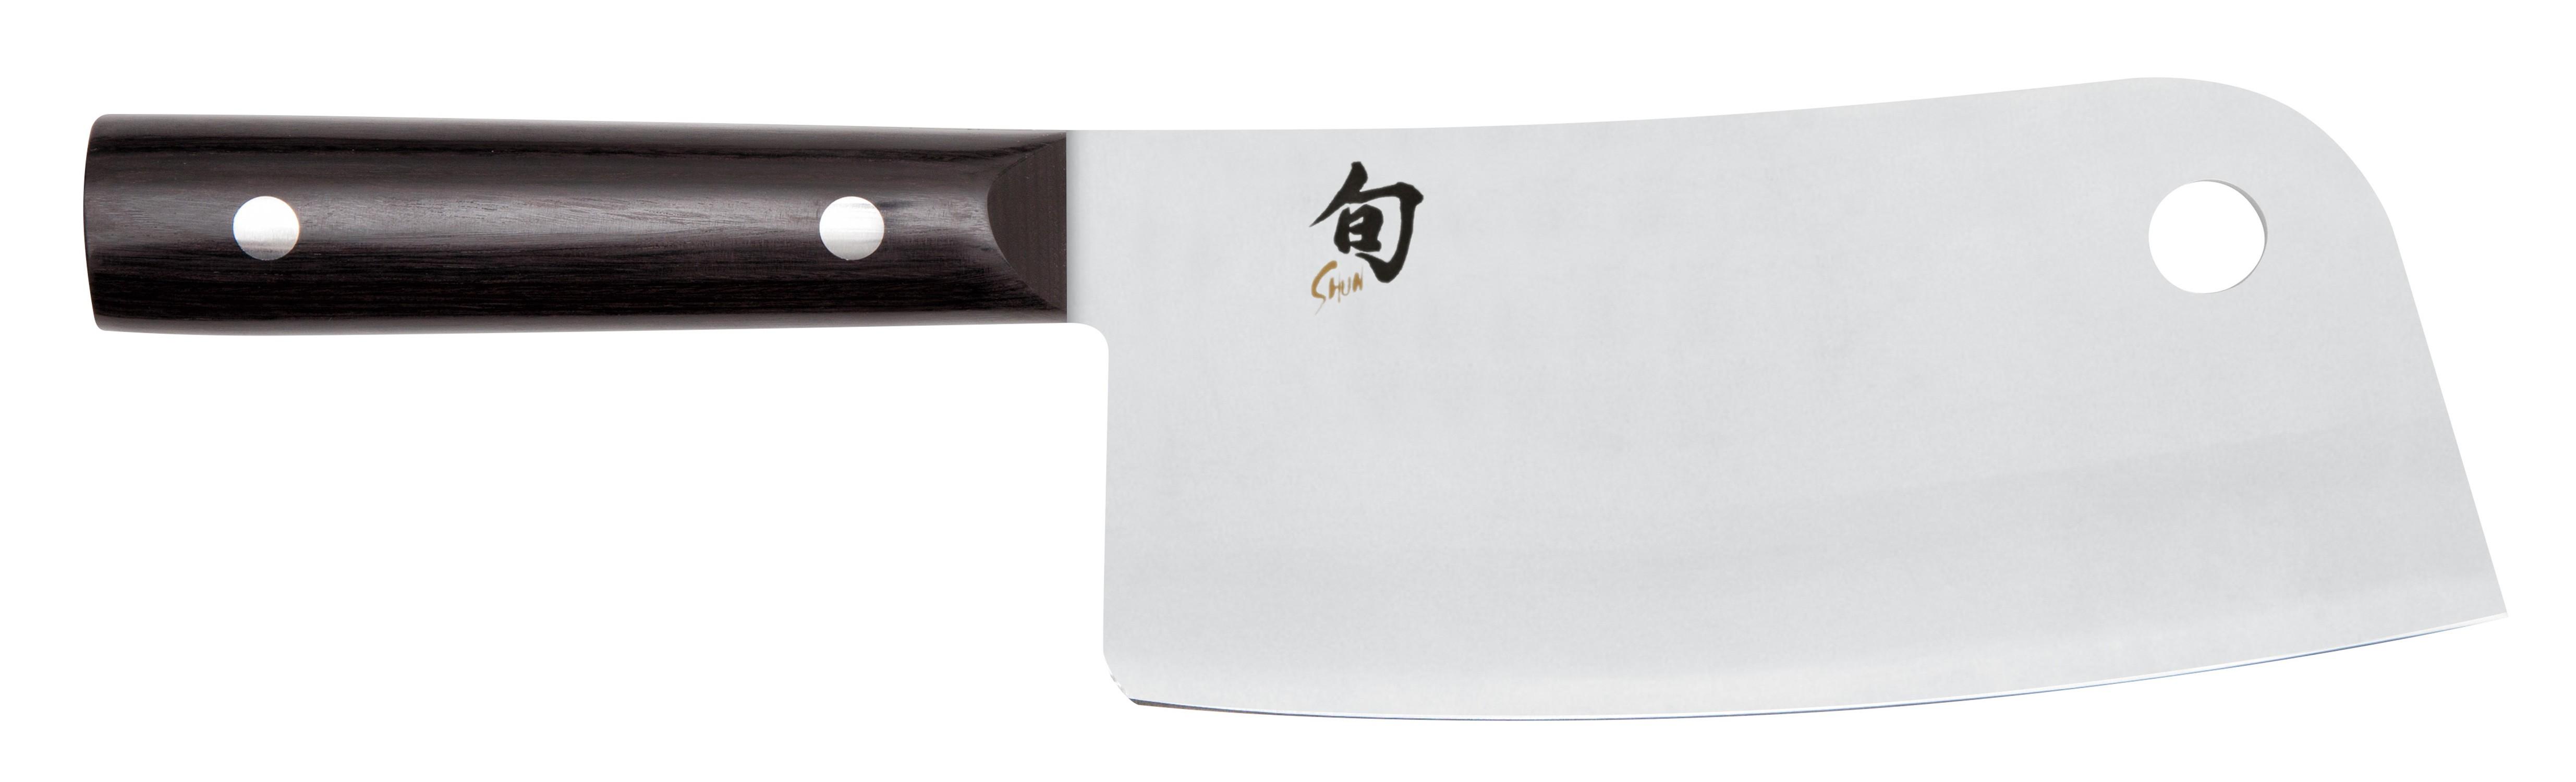 KAI SHUN CLASSIC Hackmesser 17,5cm